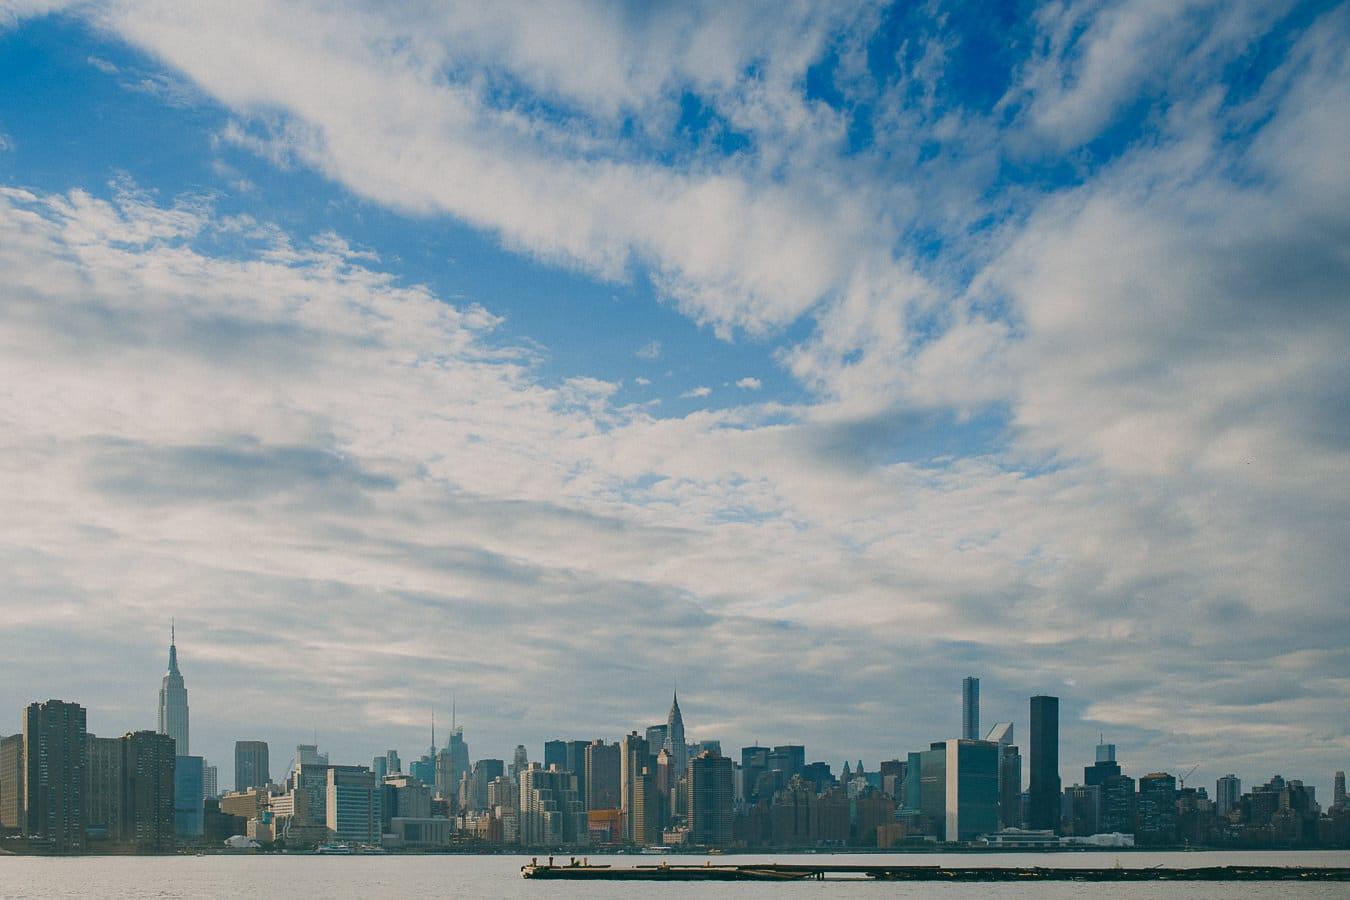 New York Skyline seen from Brooklyn